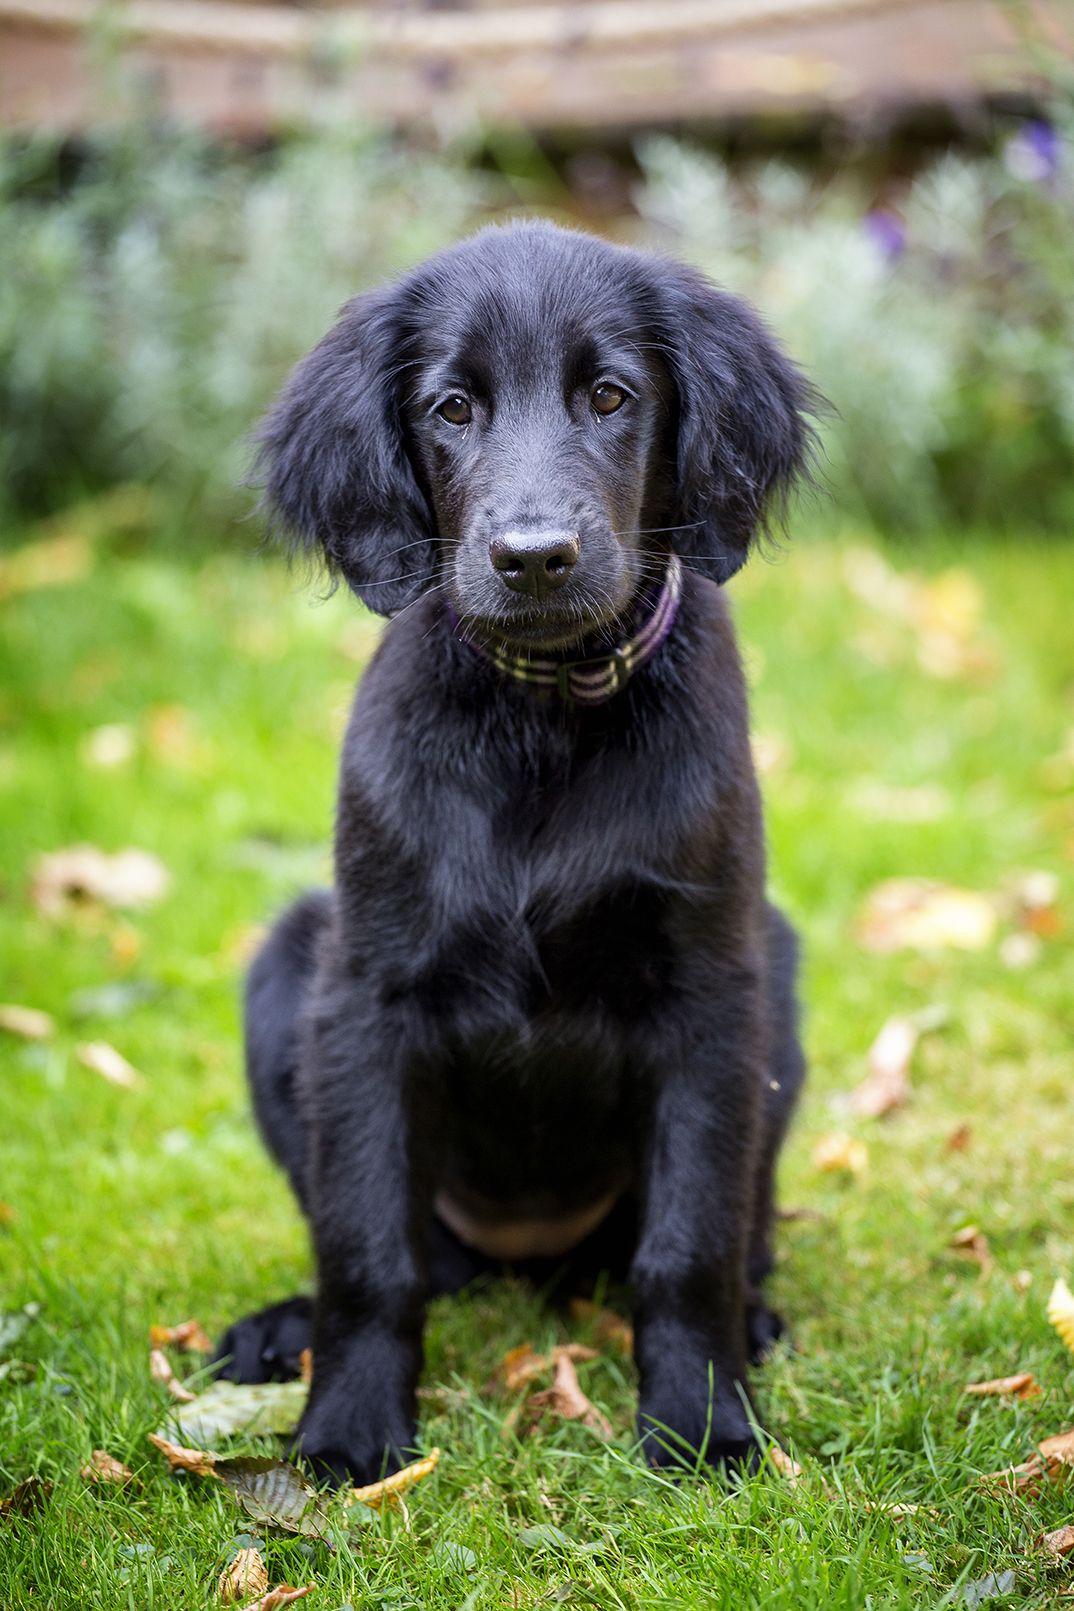 Flatcoated Retriever Puppy 14 weeks Retriever puppy